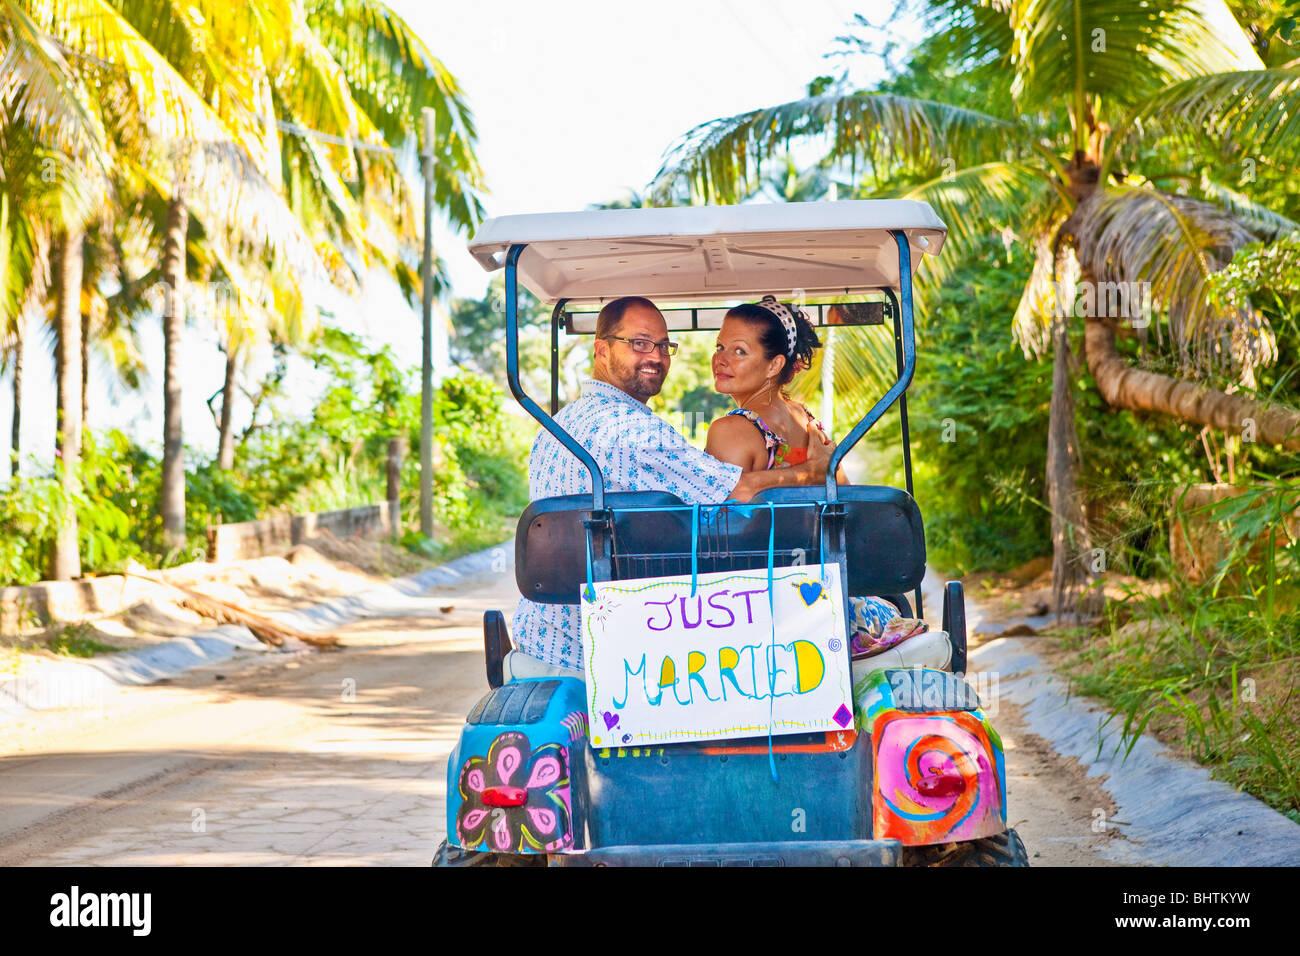 couple on honeymoon in mexico - Stock Image